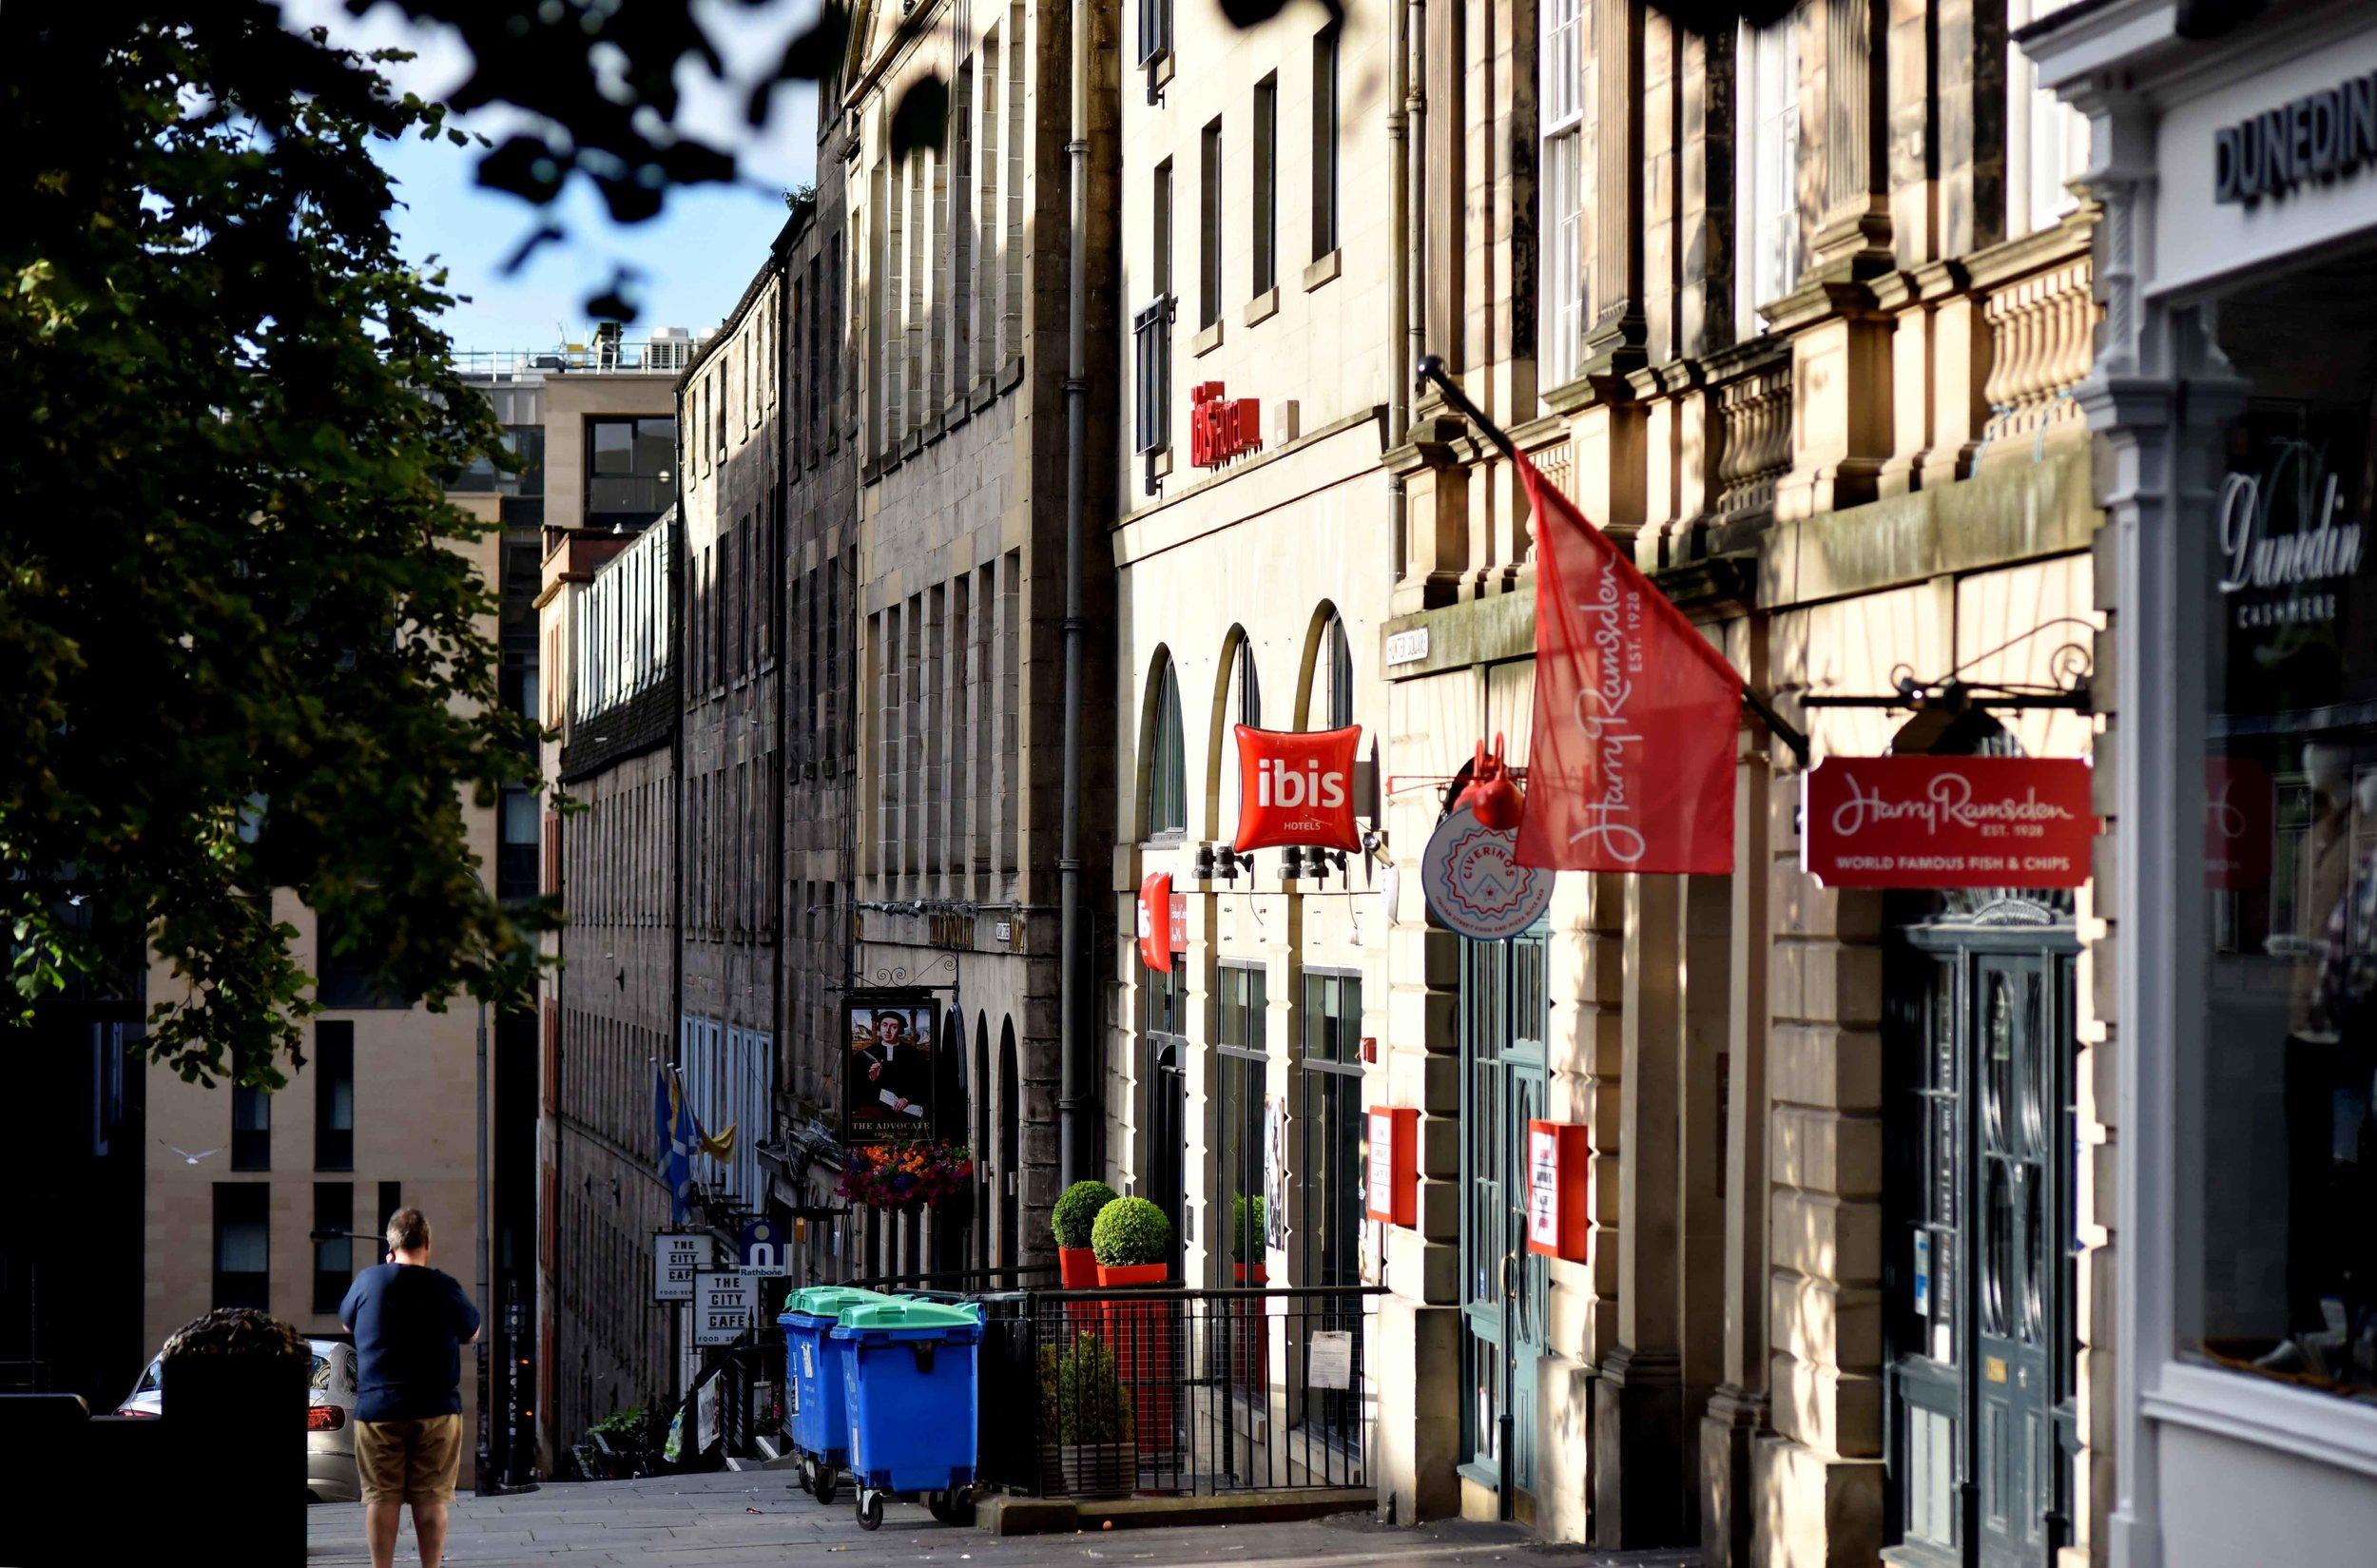 Ibis Royal Mile, Edinburgh, Scotland. Imagecopyright sourcingstyle.com